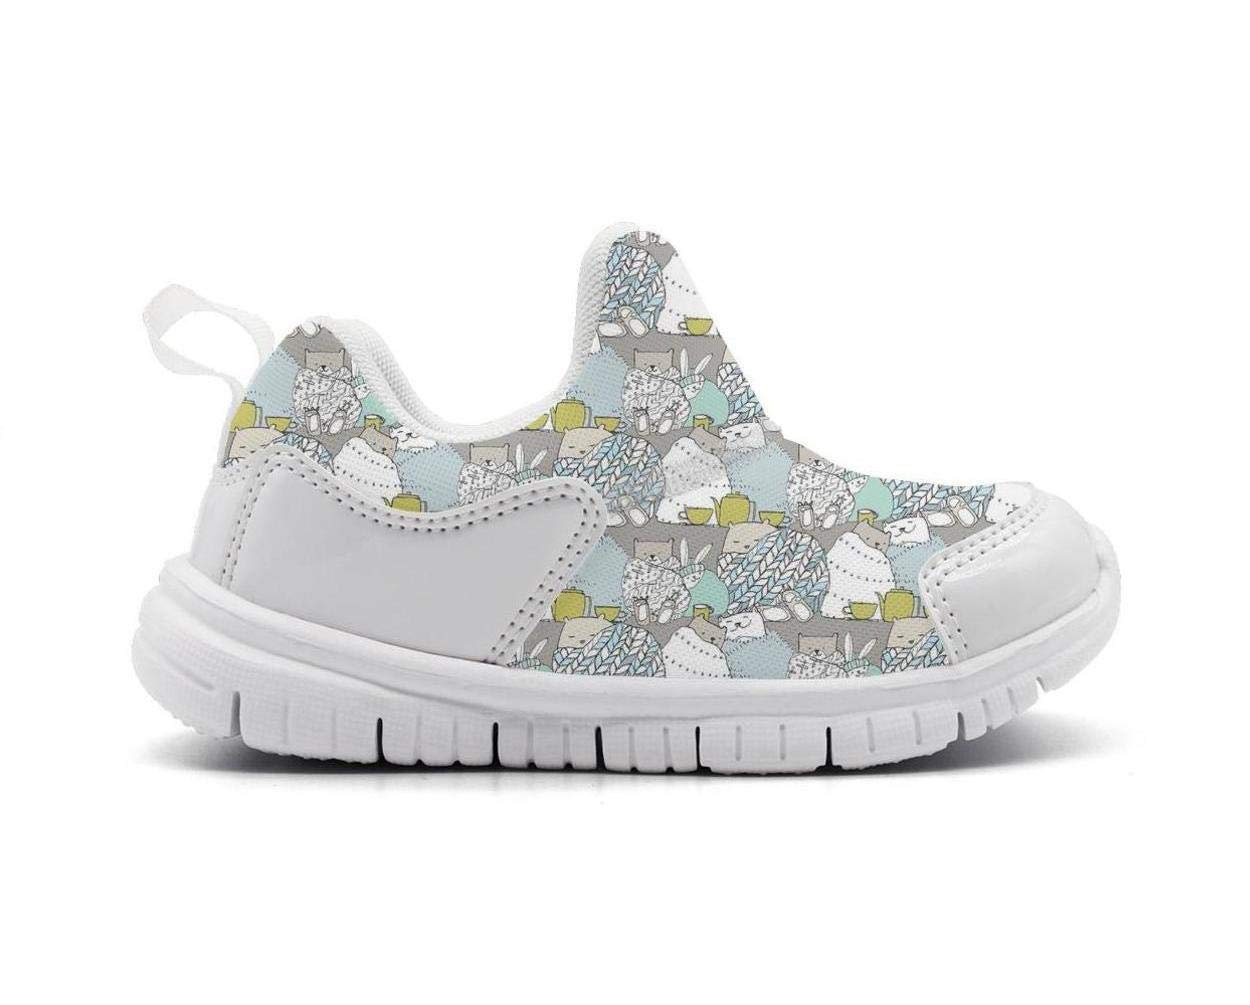 ONEYUAN Children Cozy Bear Winter Tea Snuggle Animal Kid Casual Lightweight Sport Shoes Sneakers Running Shoes